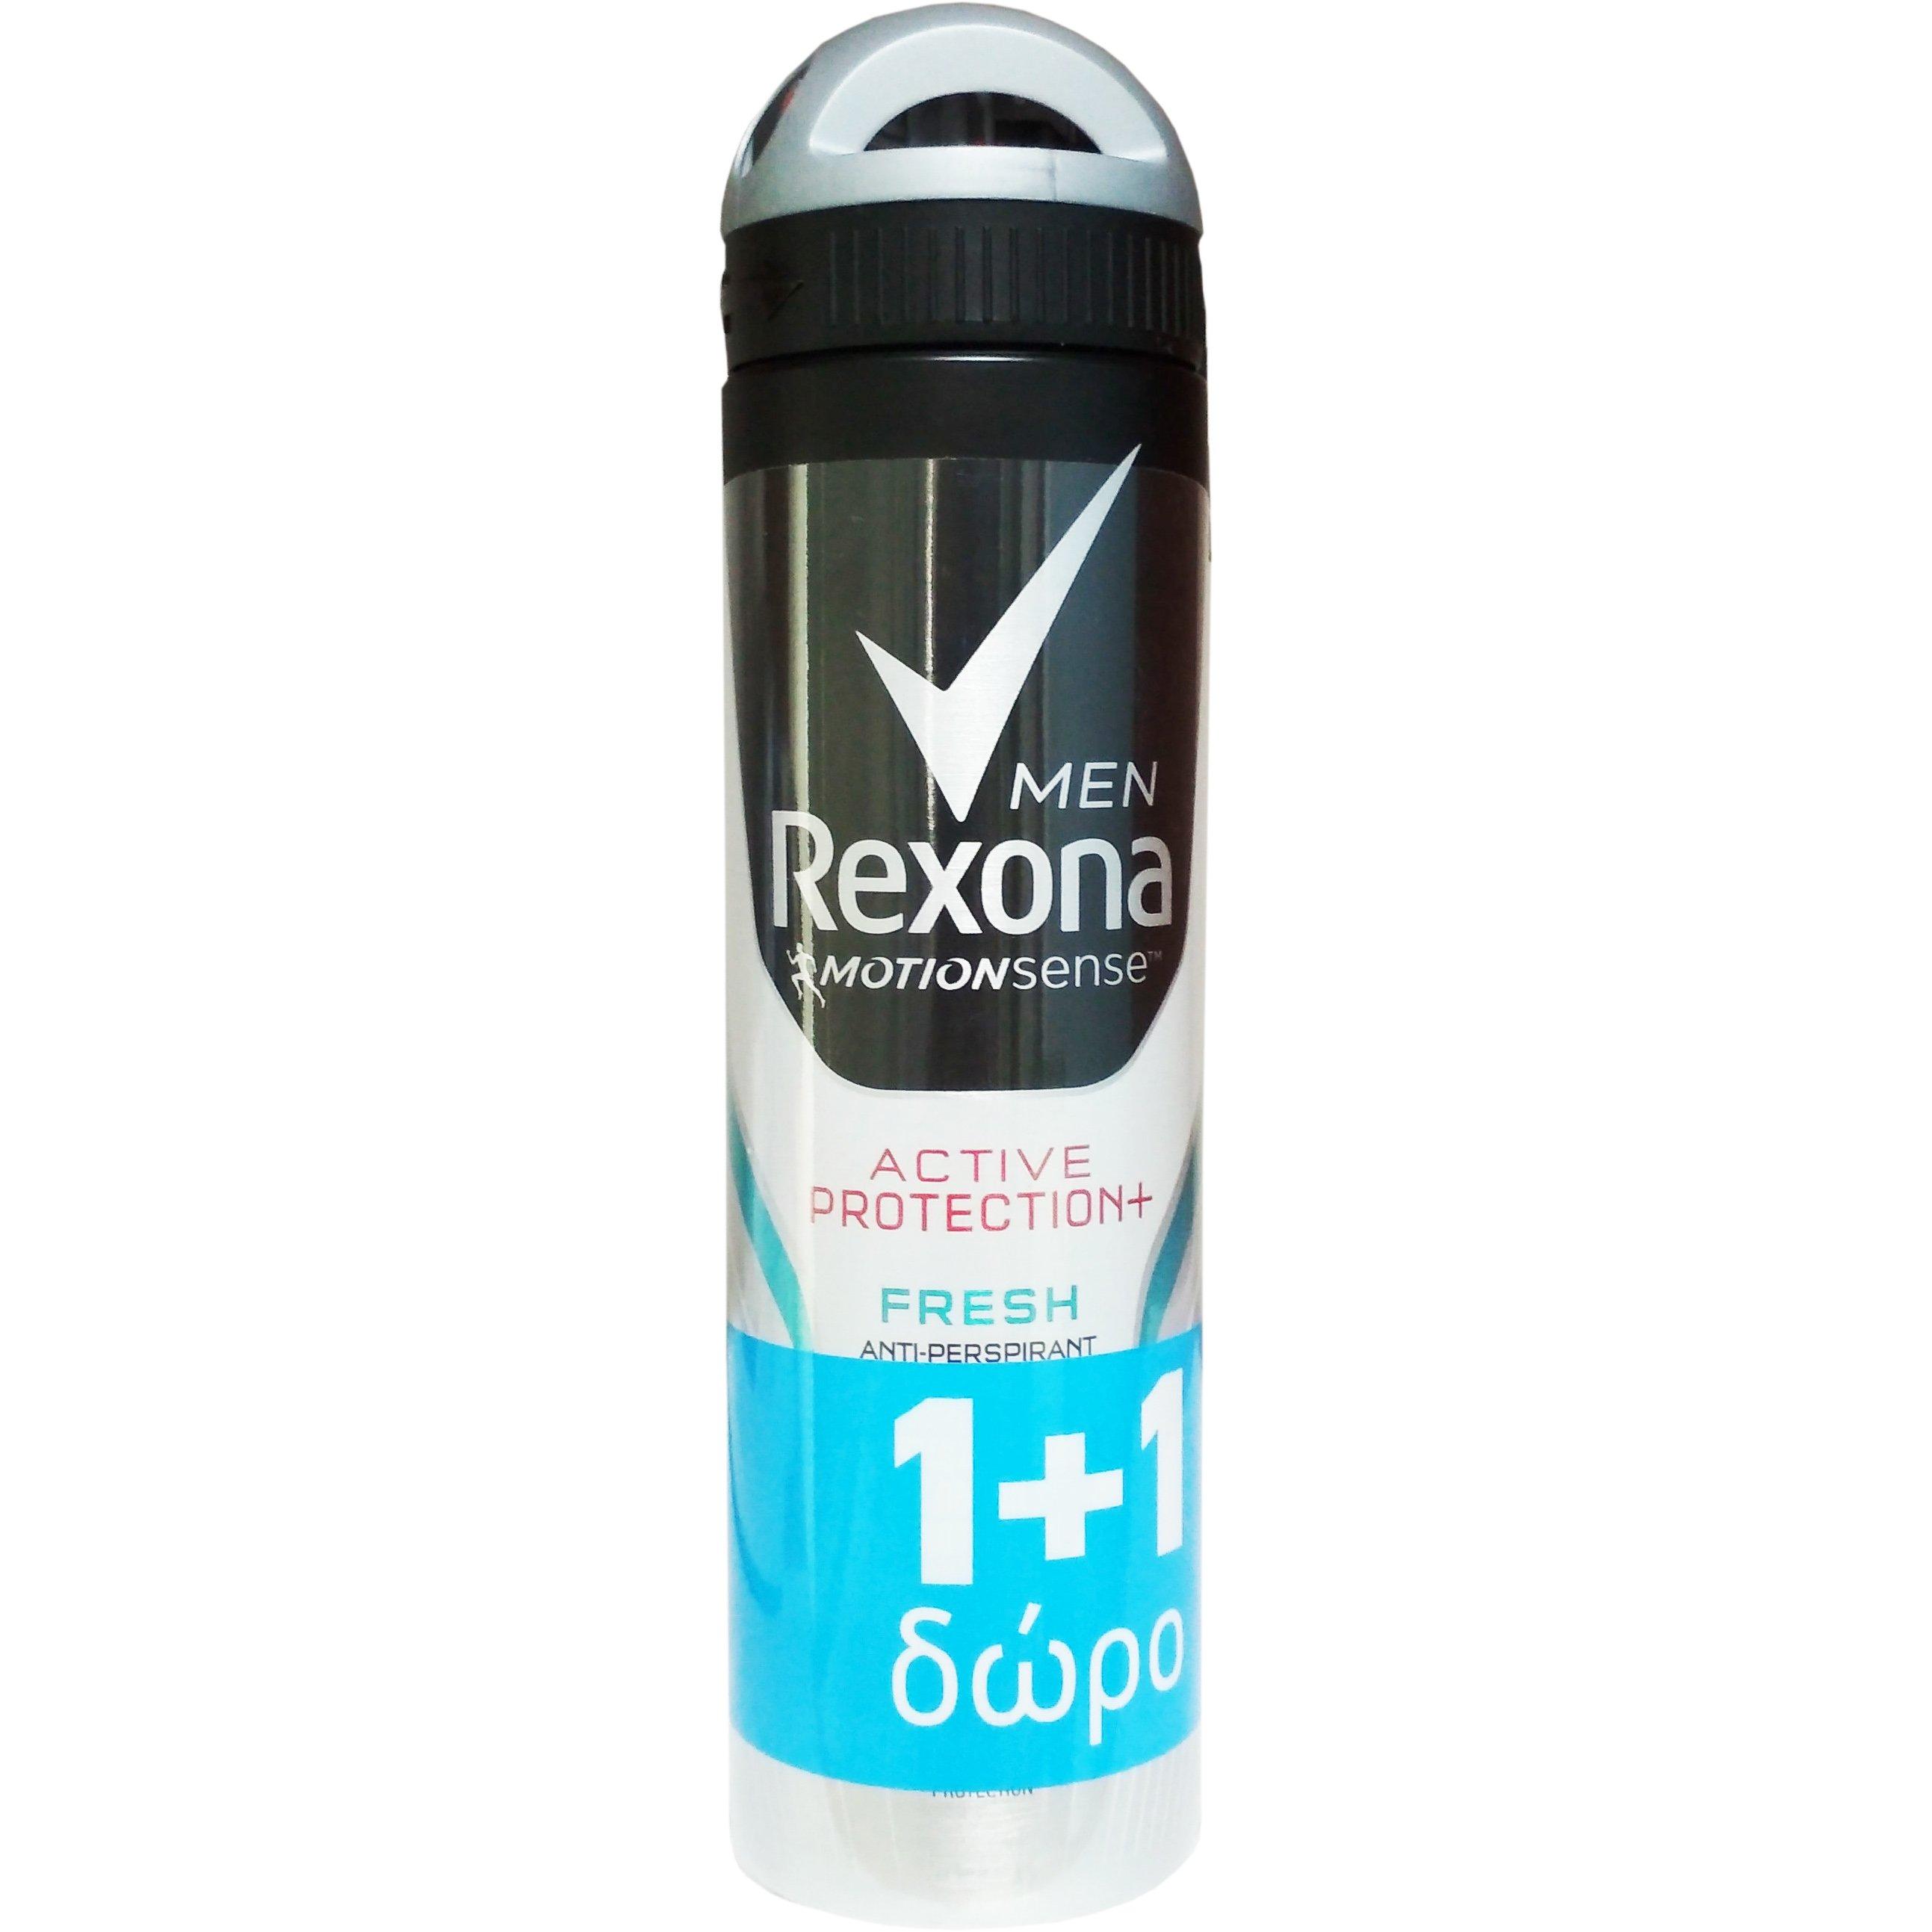 Rexona Men Πακέτο Προσφοράς Active Protection+ Fresh Spray Ανδρικό Αποσμητικό για Αίσθηση Φρεσκάδας 2x150ml 1+1 Δώρο